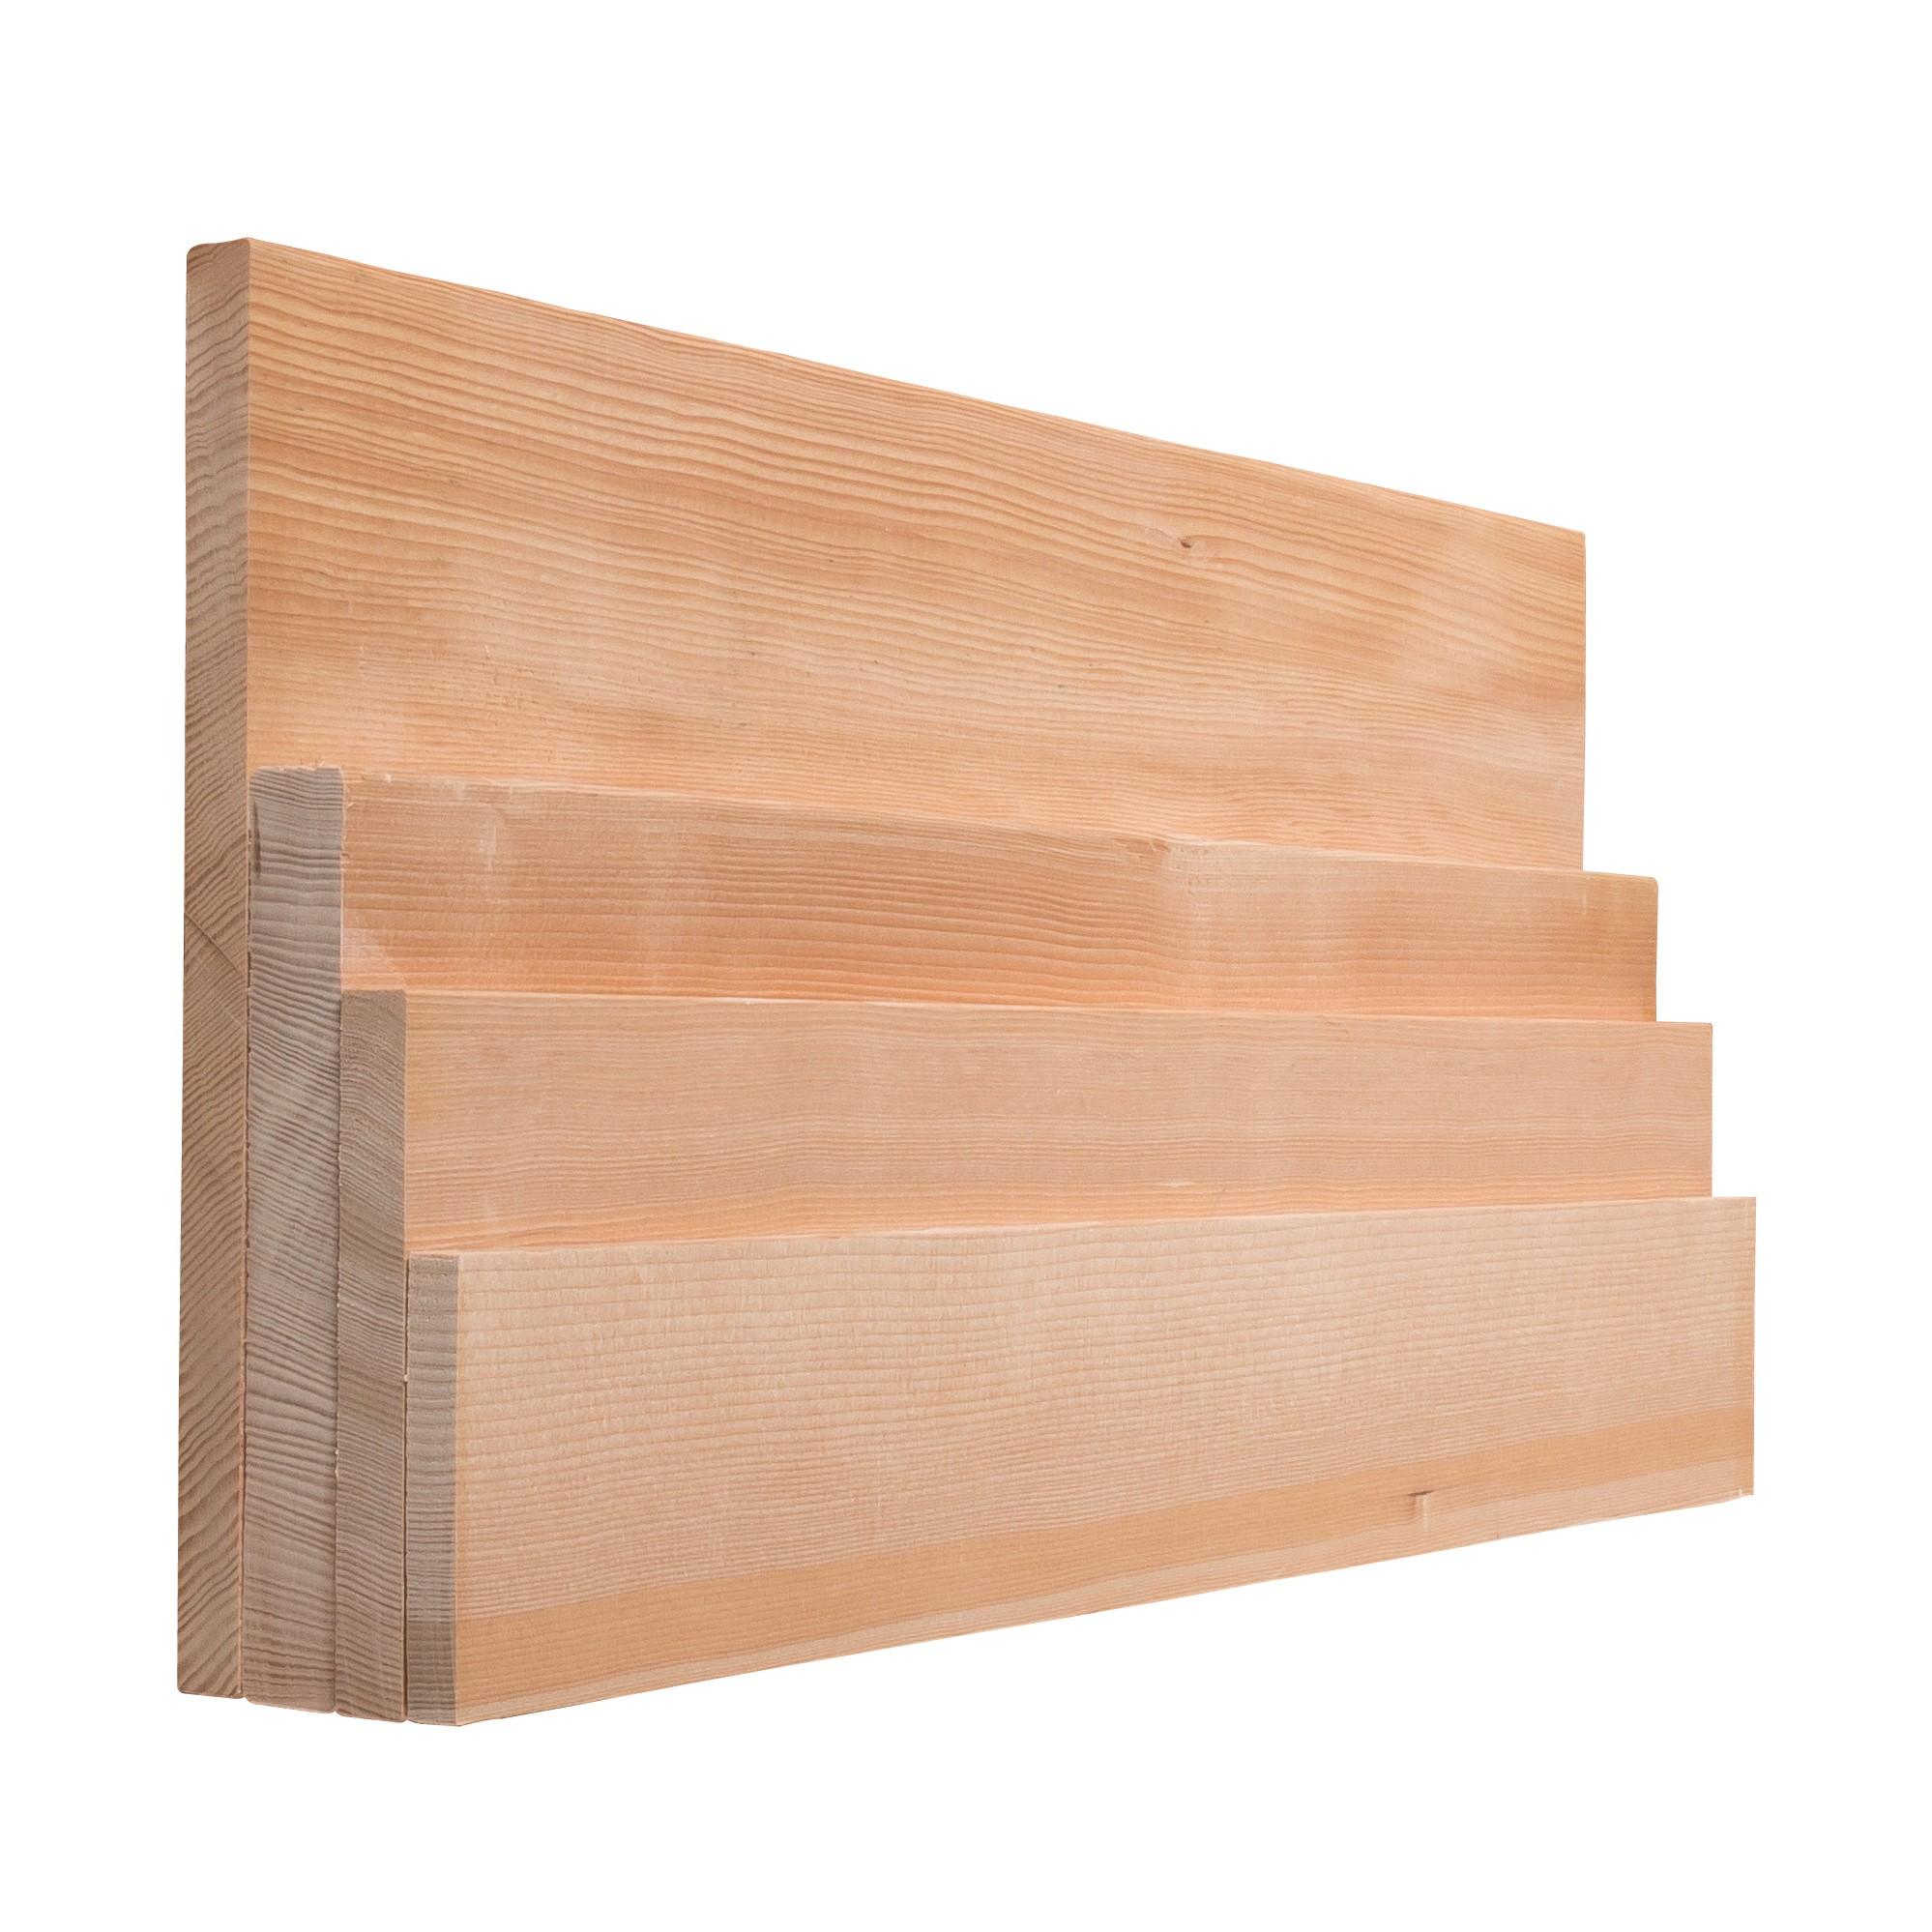 Hemlock Lumber Prices